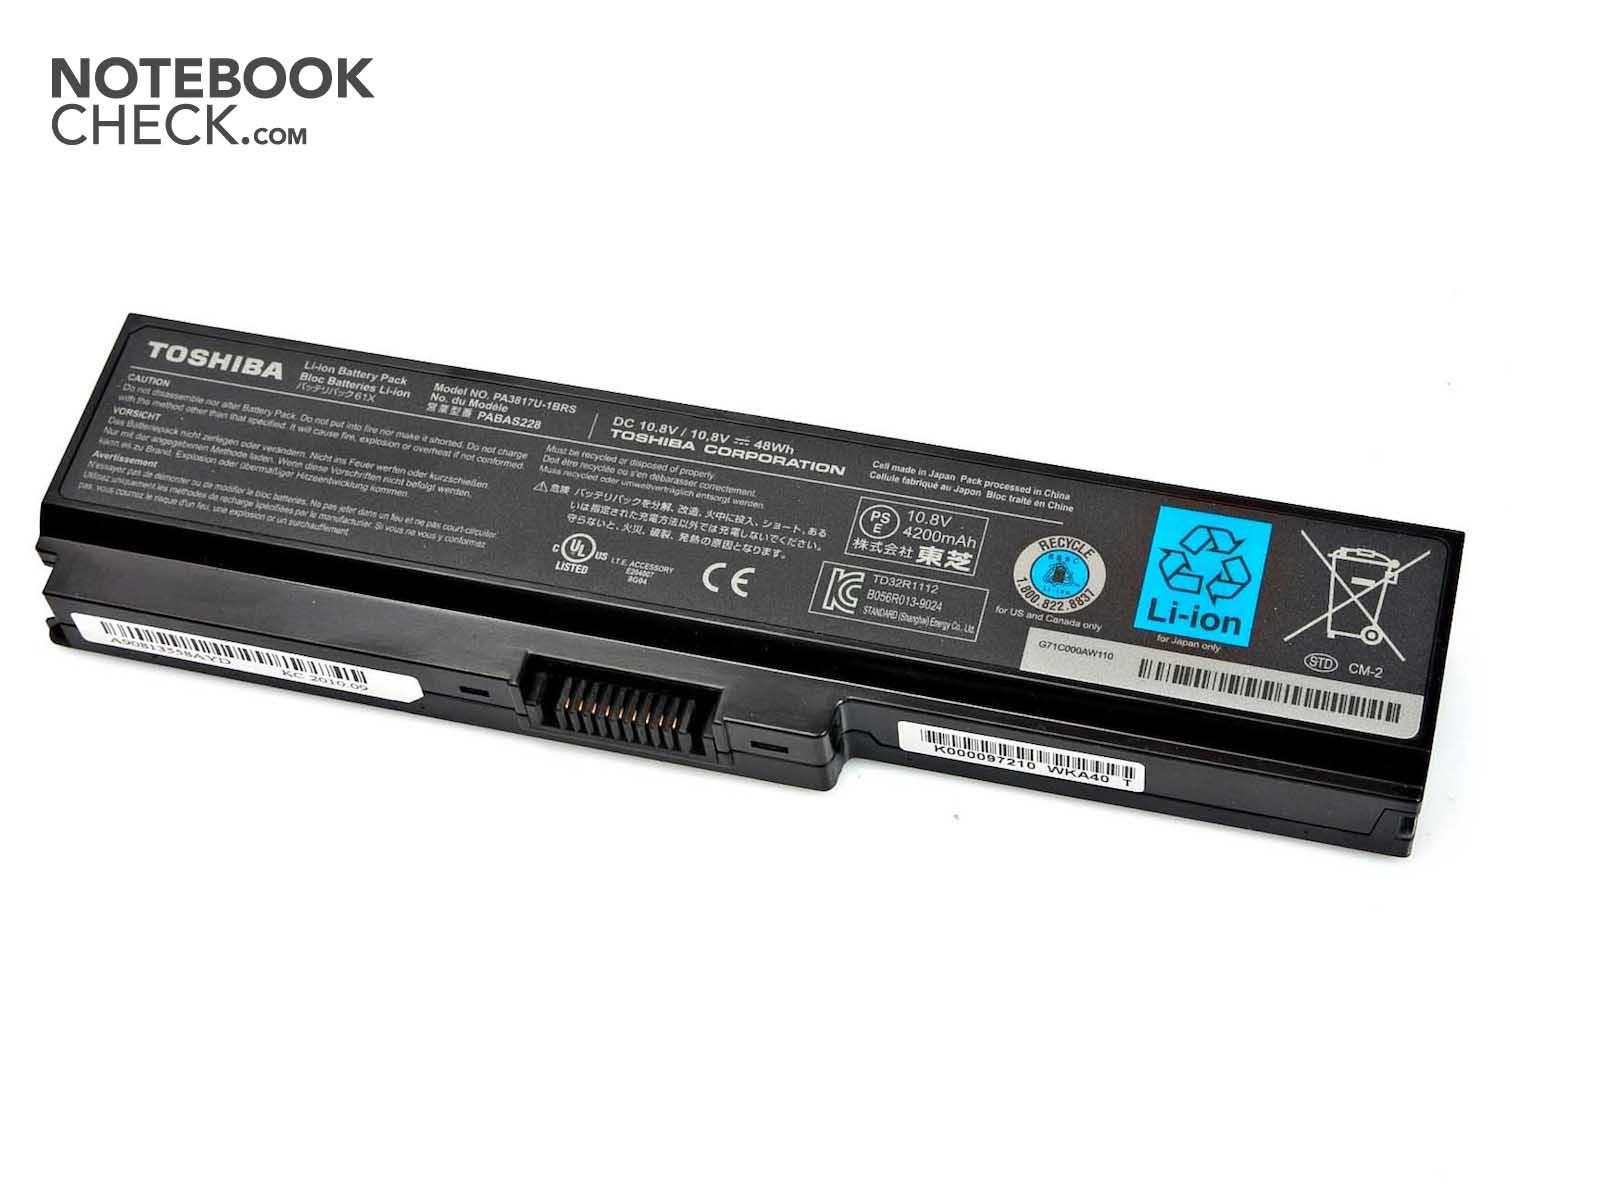 Review Toshiba Satellite C660 Notebook Notebookcheck Net